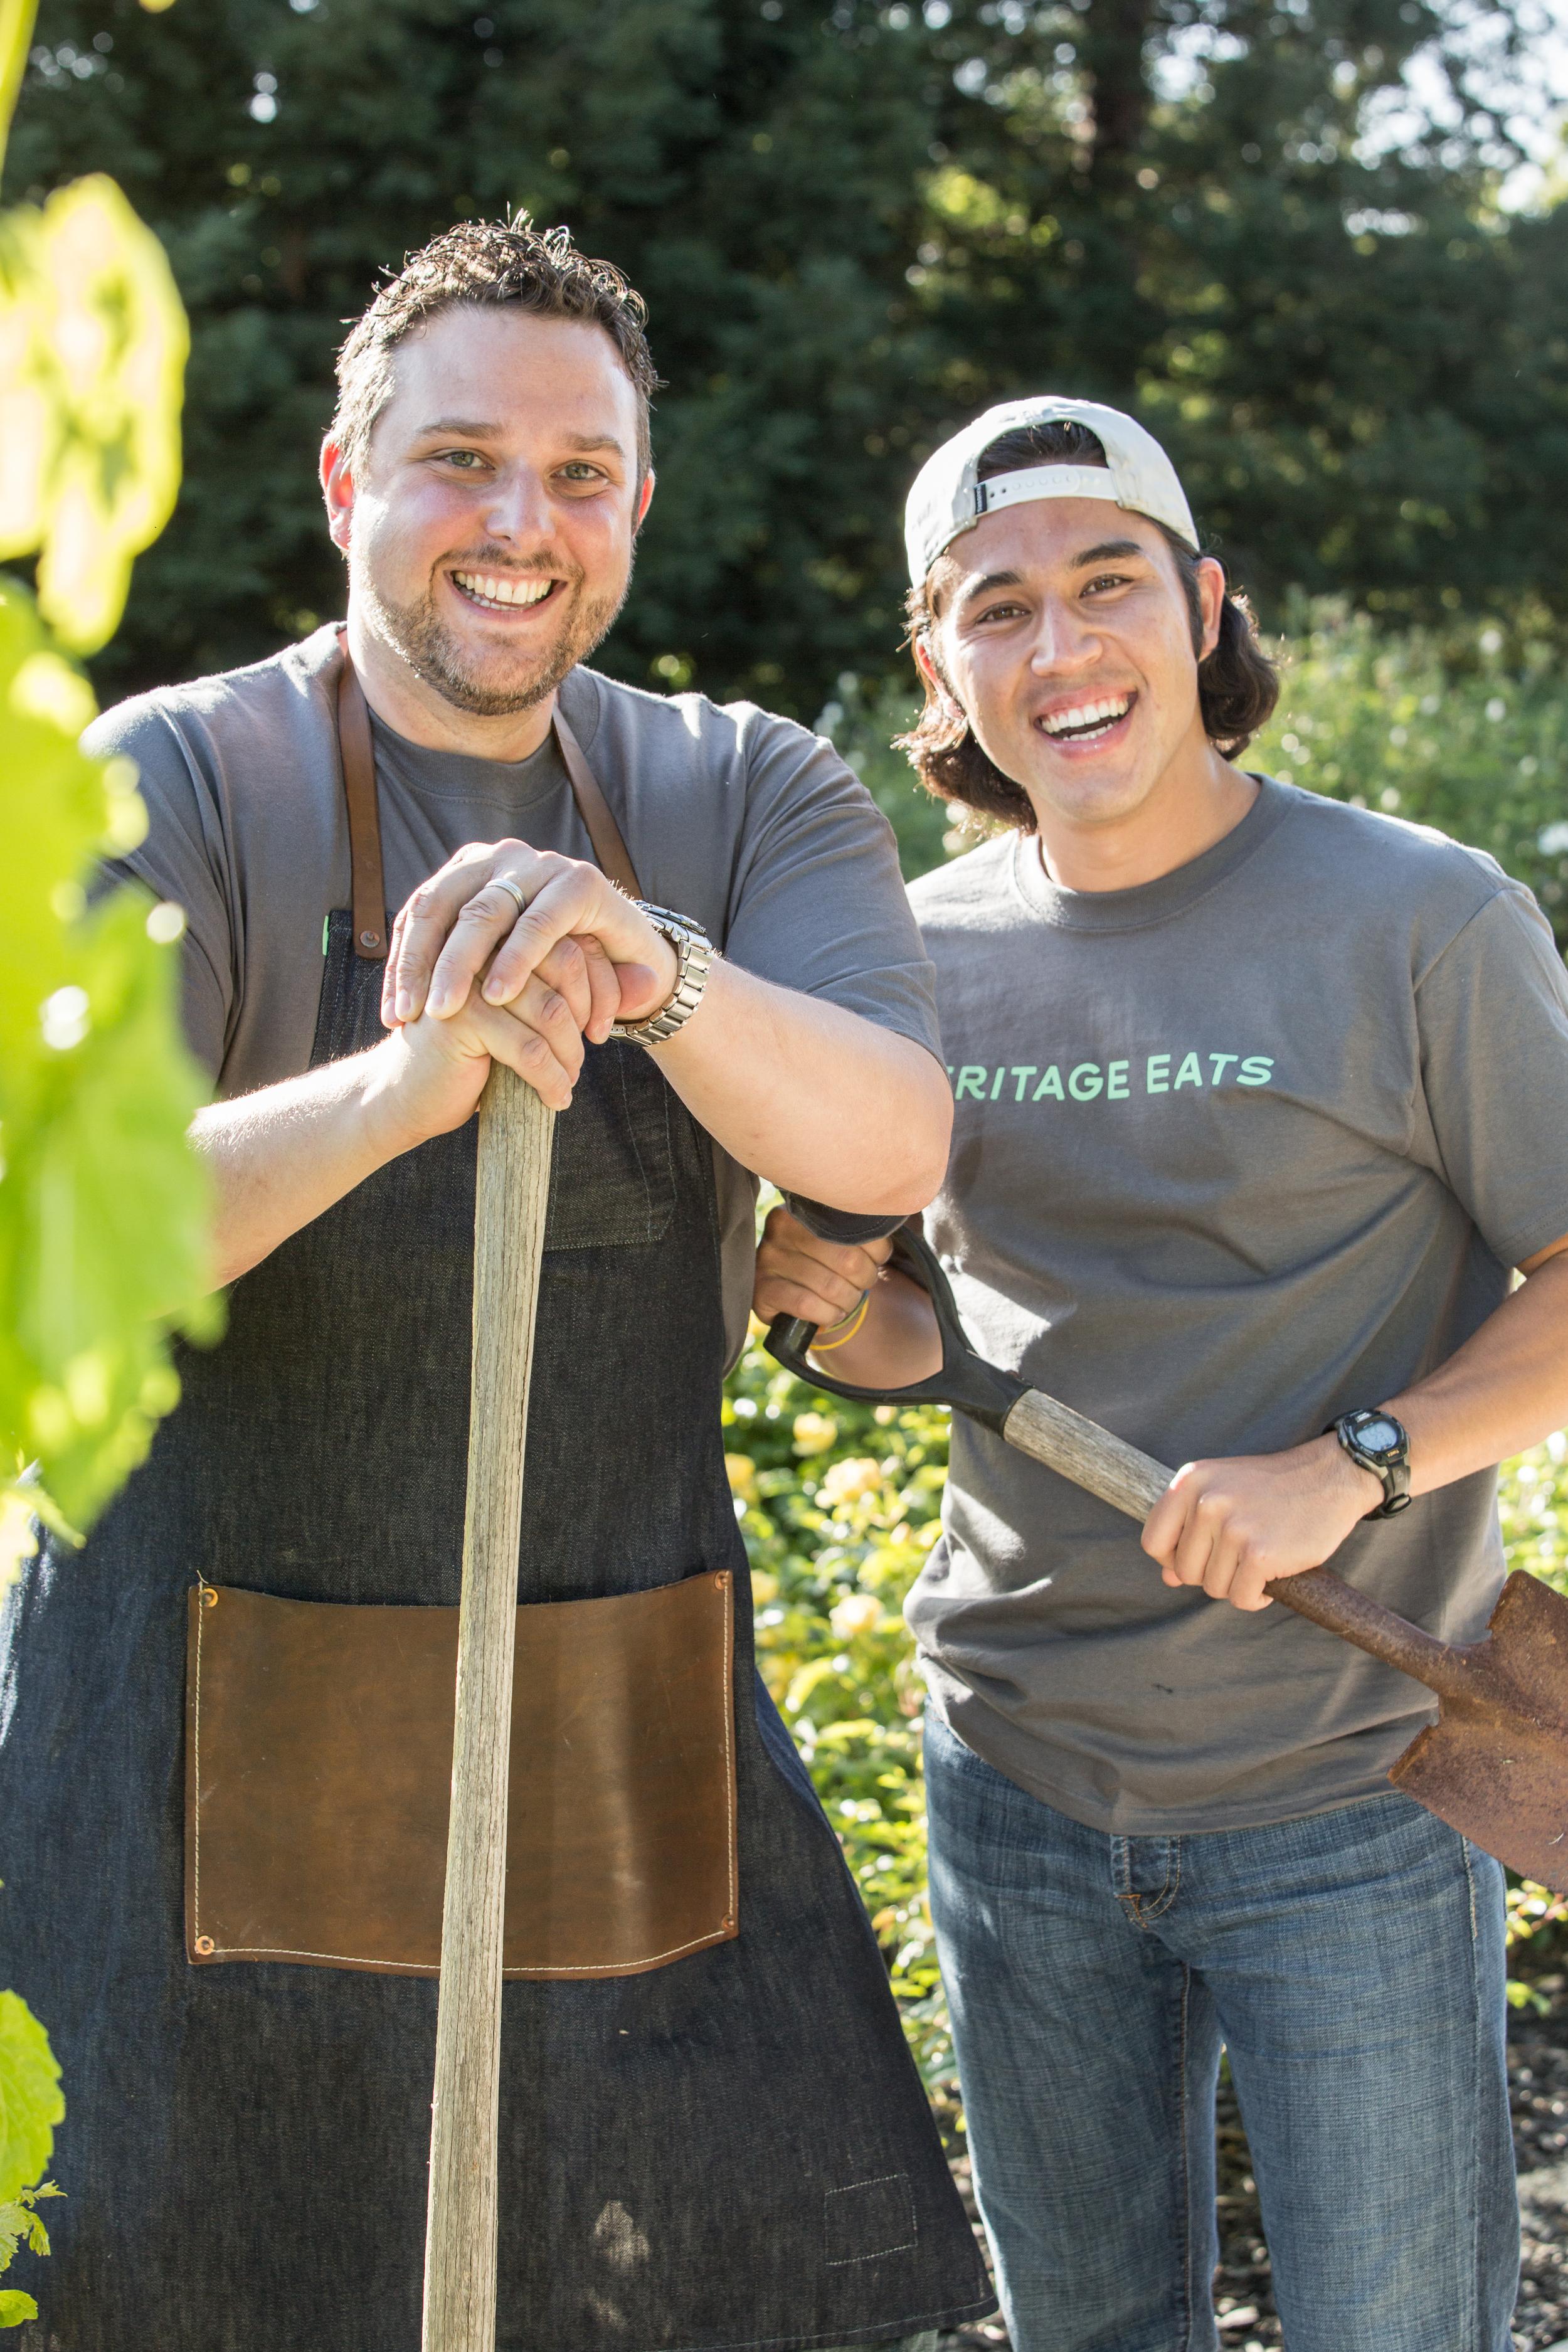 Heritage Eats co-founder Chef Jason Kupper and Ben Koenig